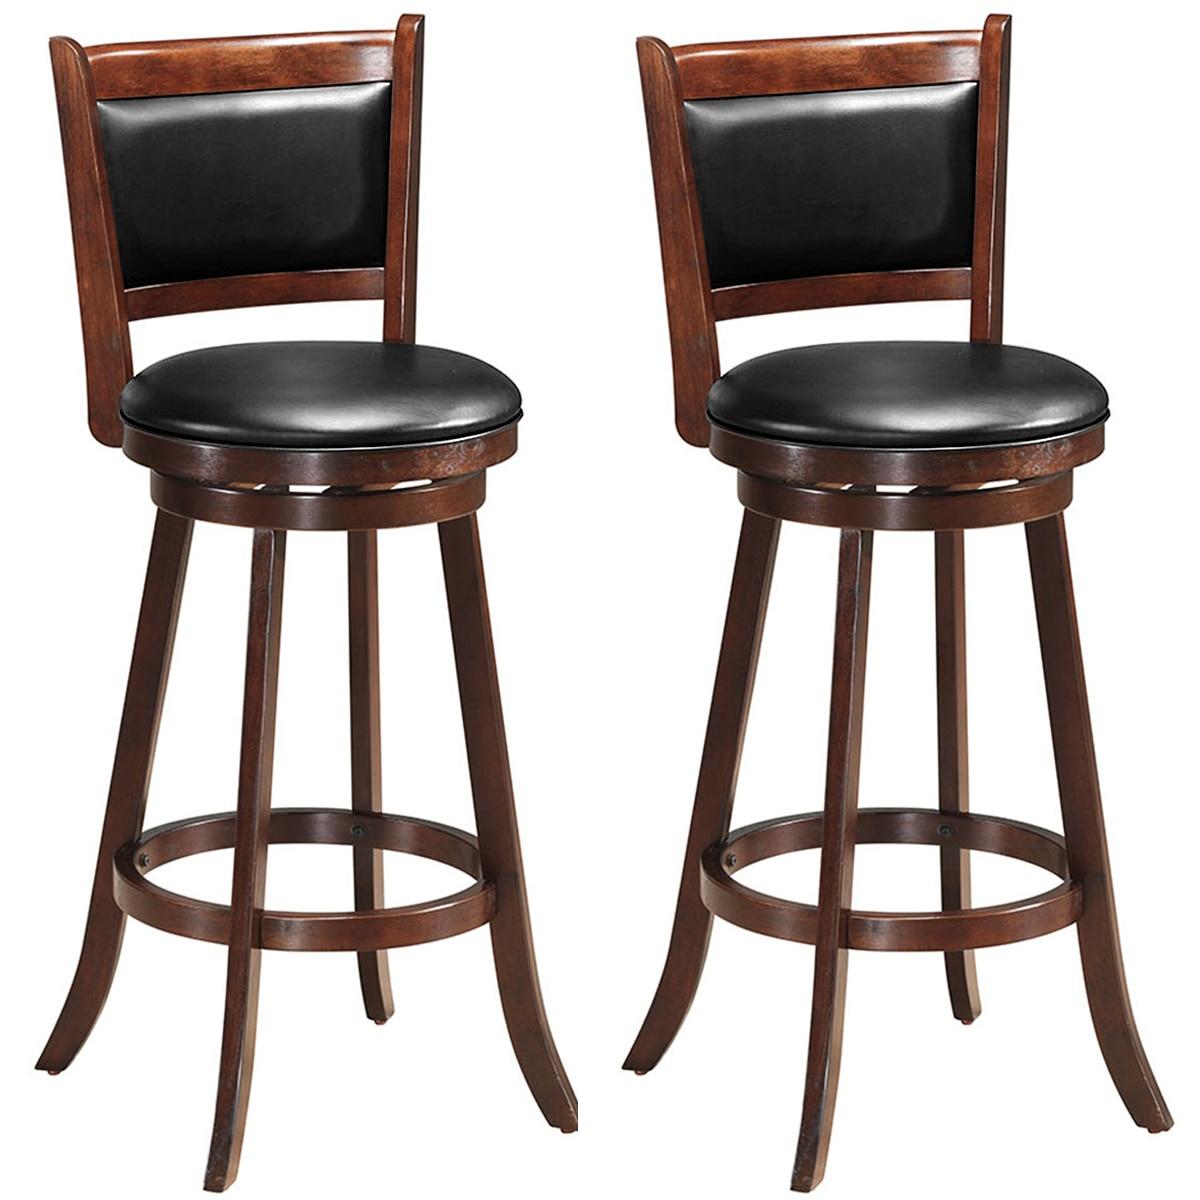 Costway-كرسي طعام خشبي منجد مع مقعد إسبرسو ، مجموعة من 2 ، 29 بوصة ، شريط دوار ، ارتفاع